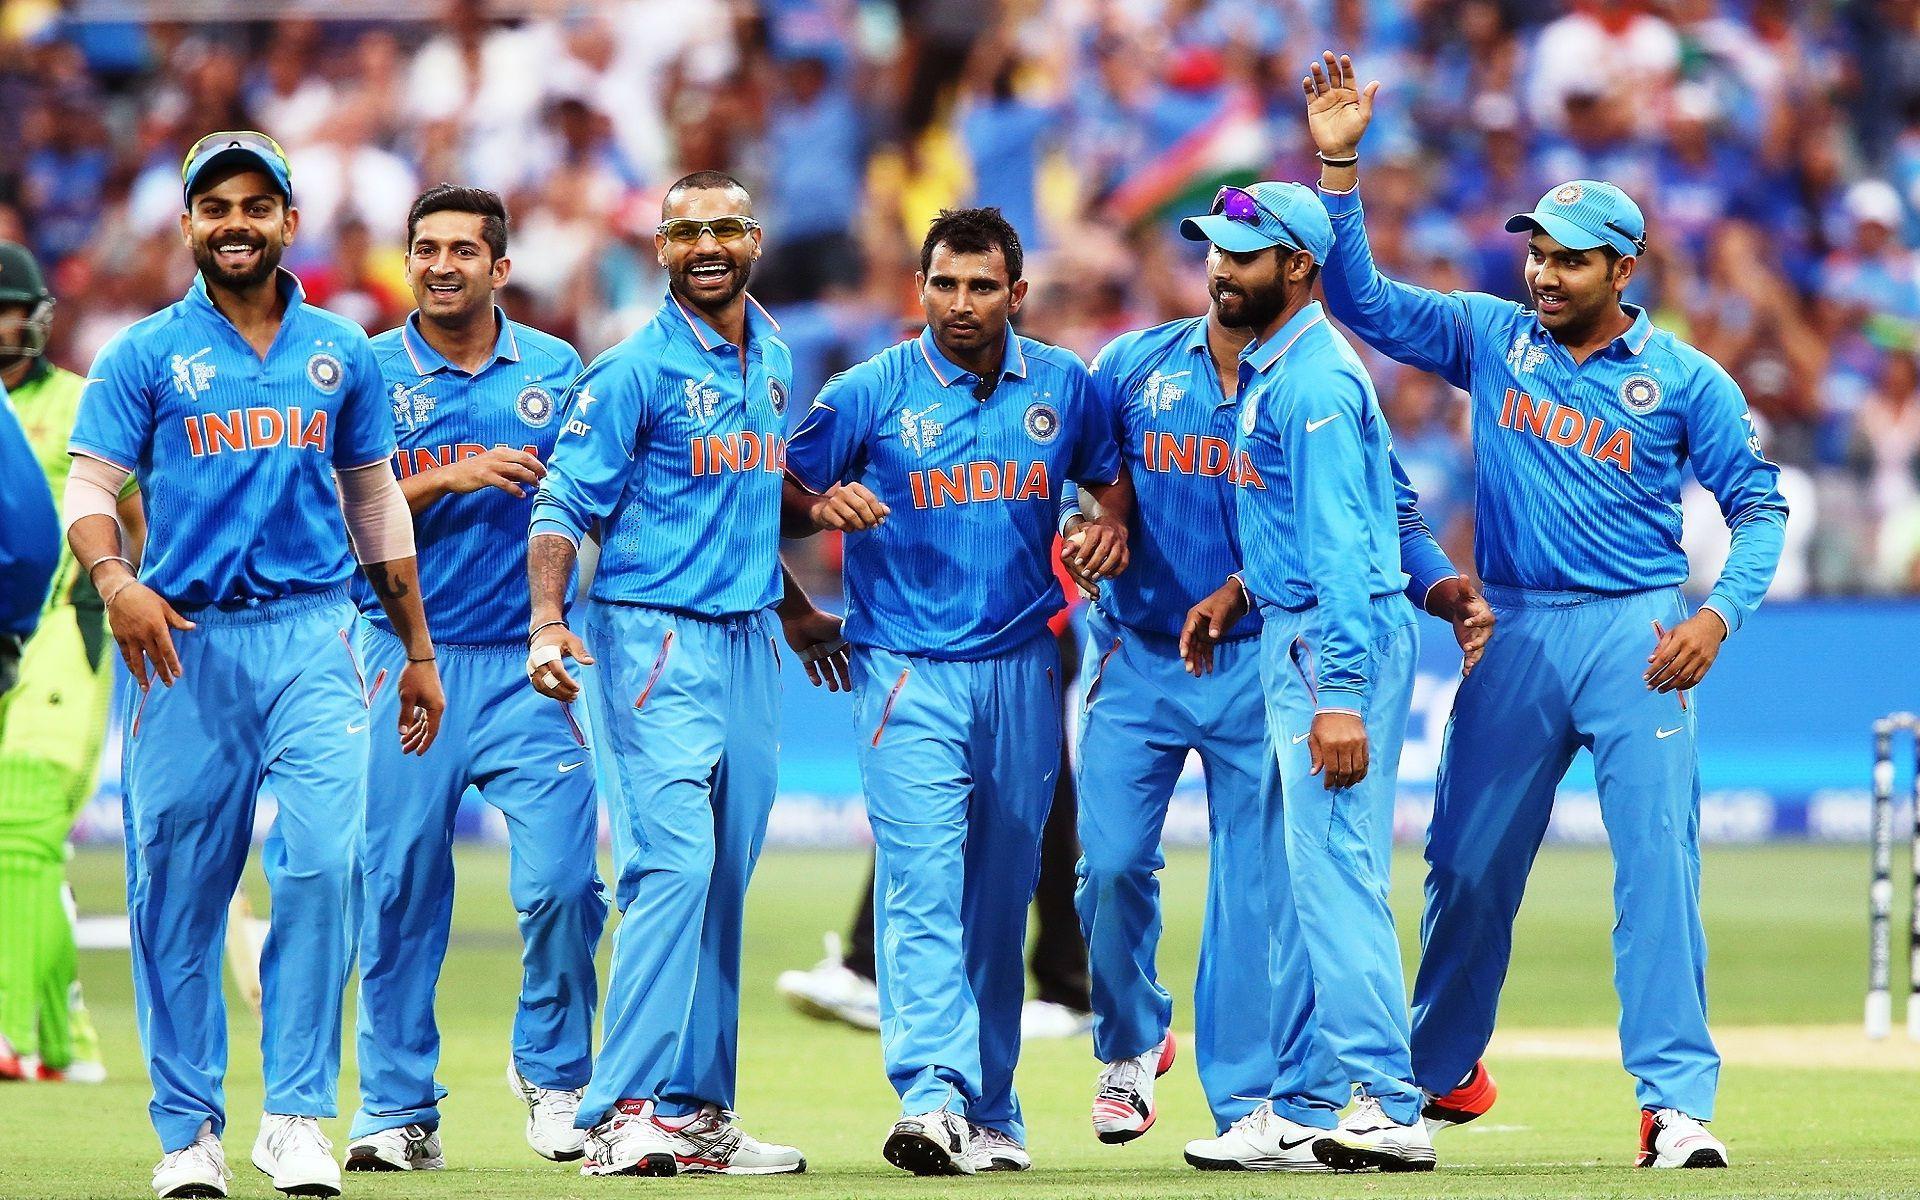 India Cricket Team Background 7